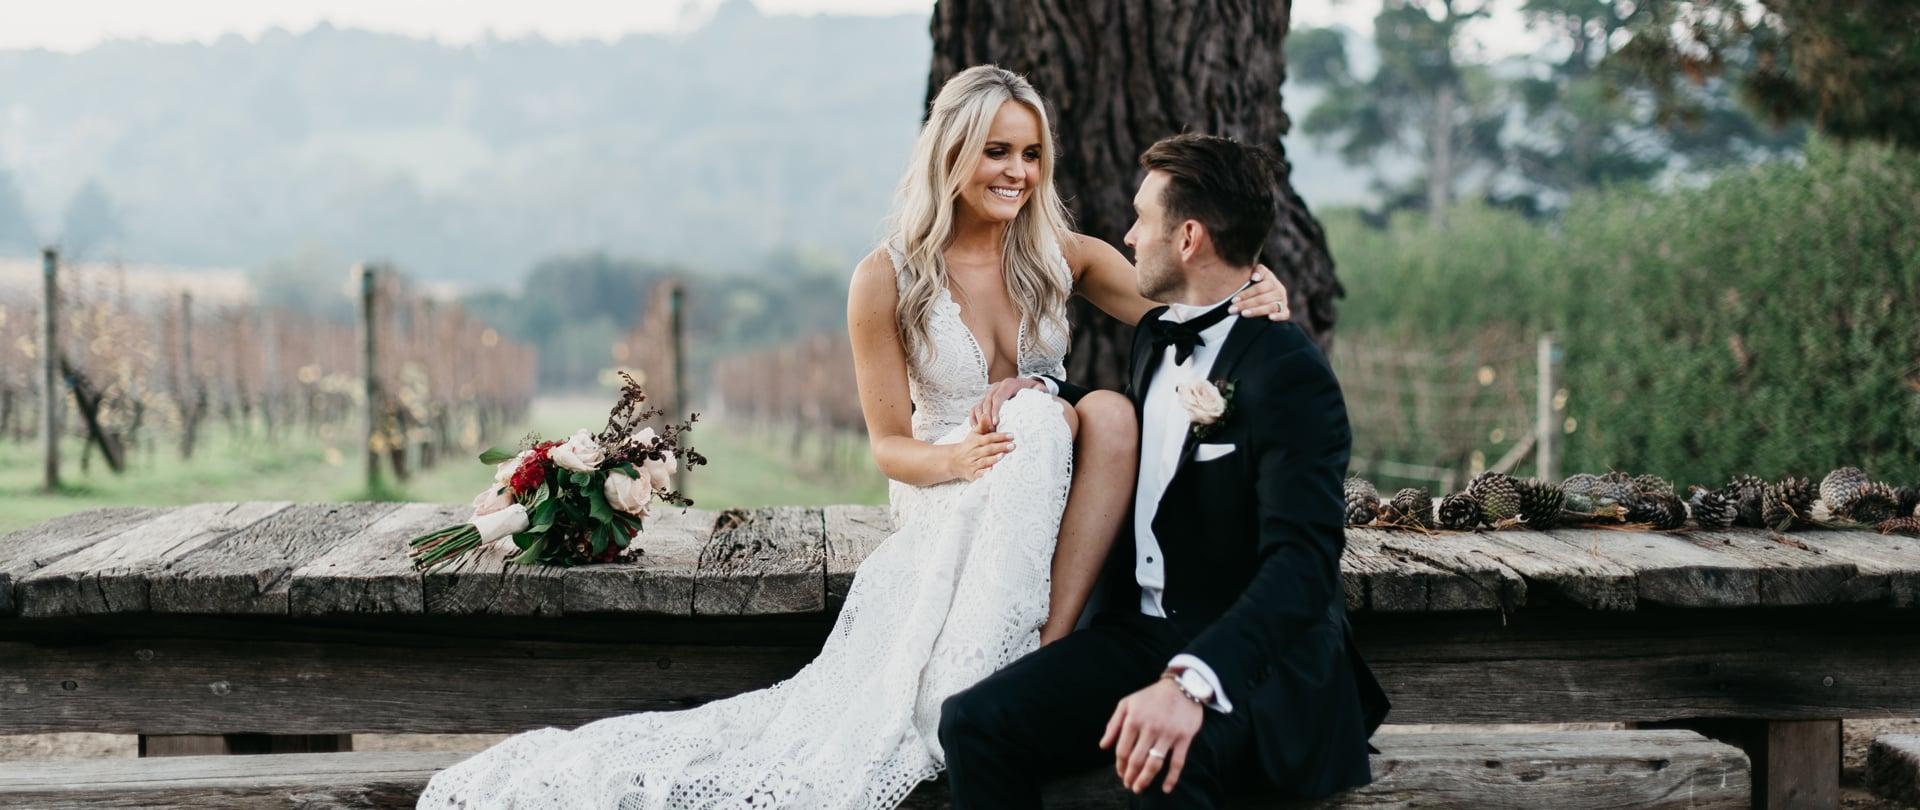 Lizzie & Tom Wedding Video Filmed at Mornington Peninsula, Victoria